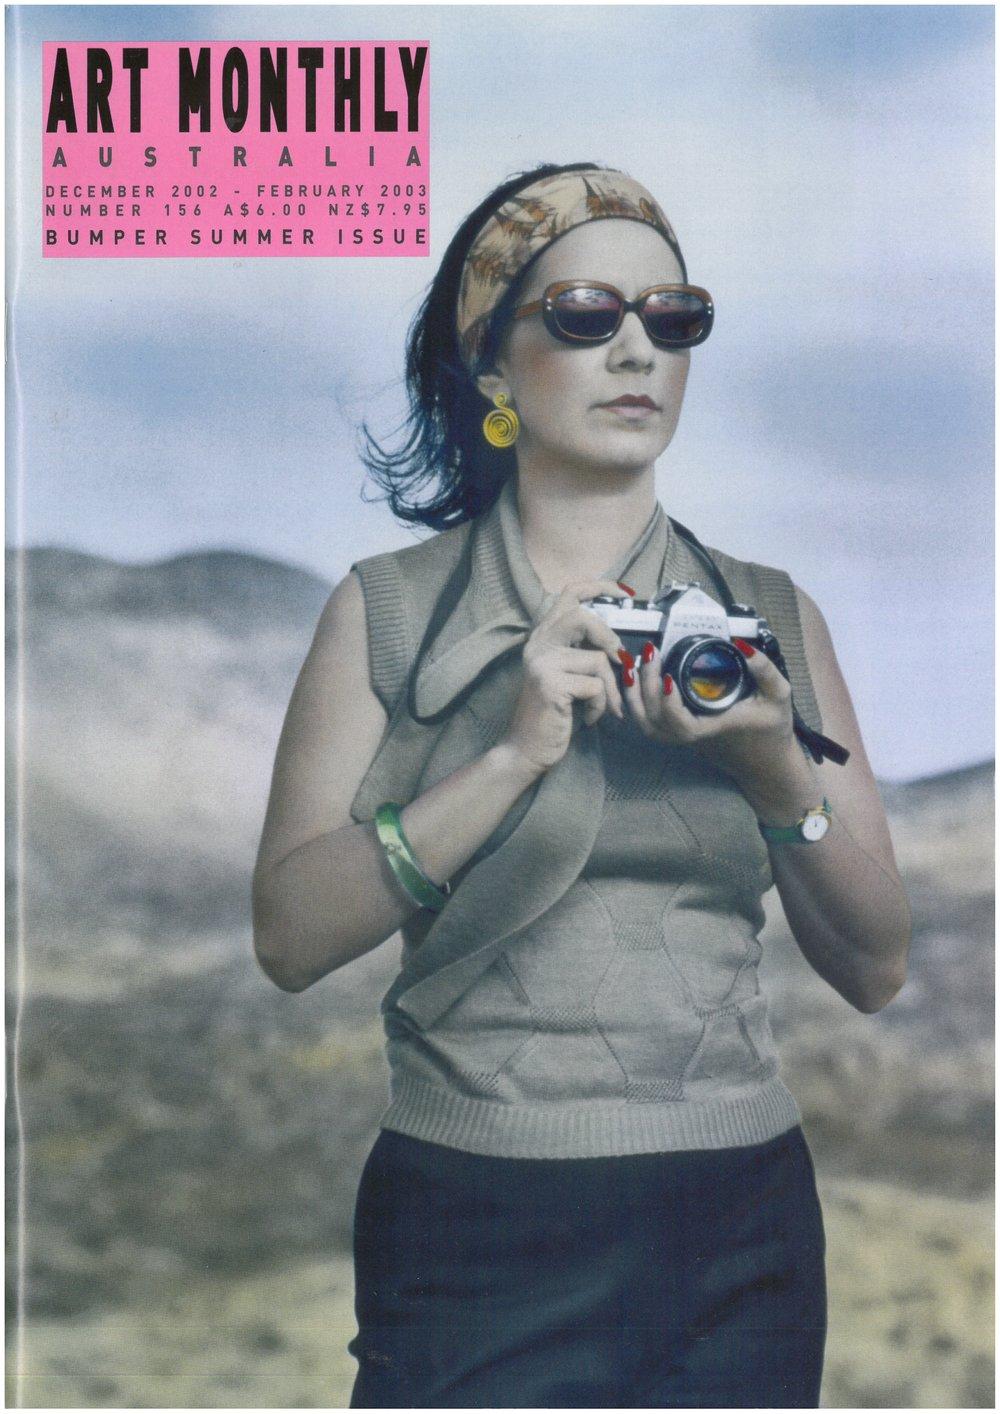 Issue 156 December 2002 - February 2003